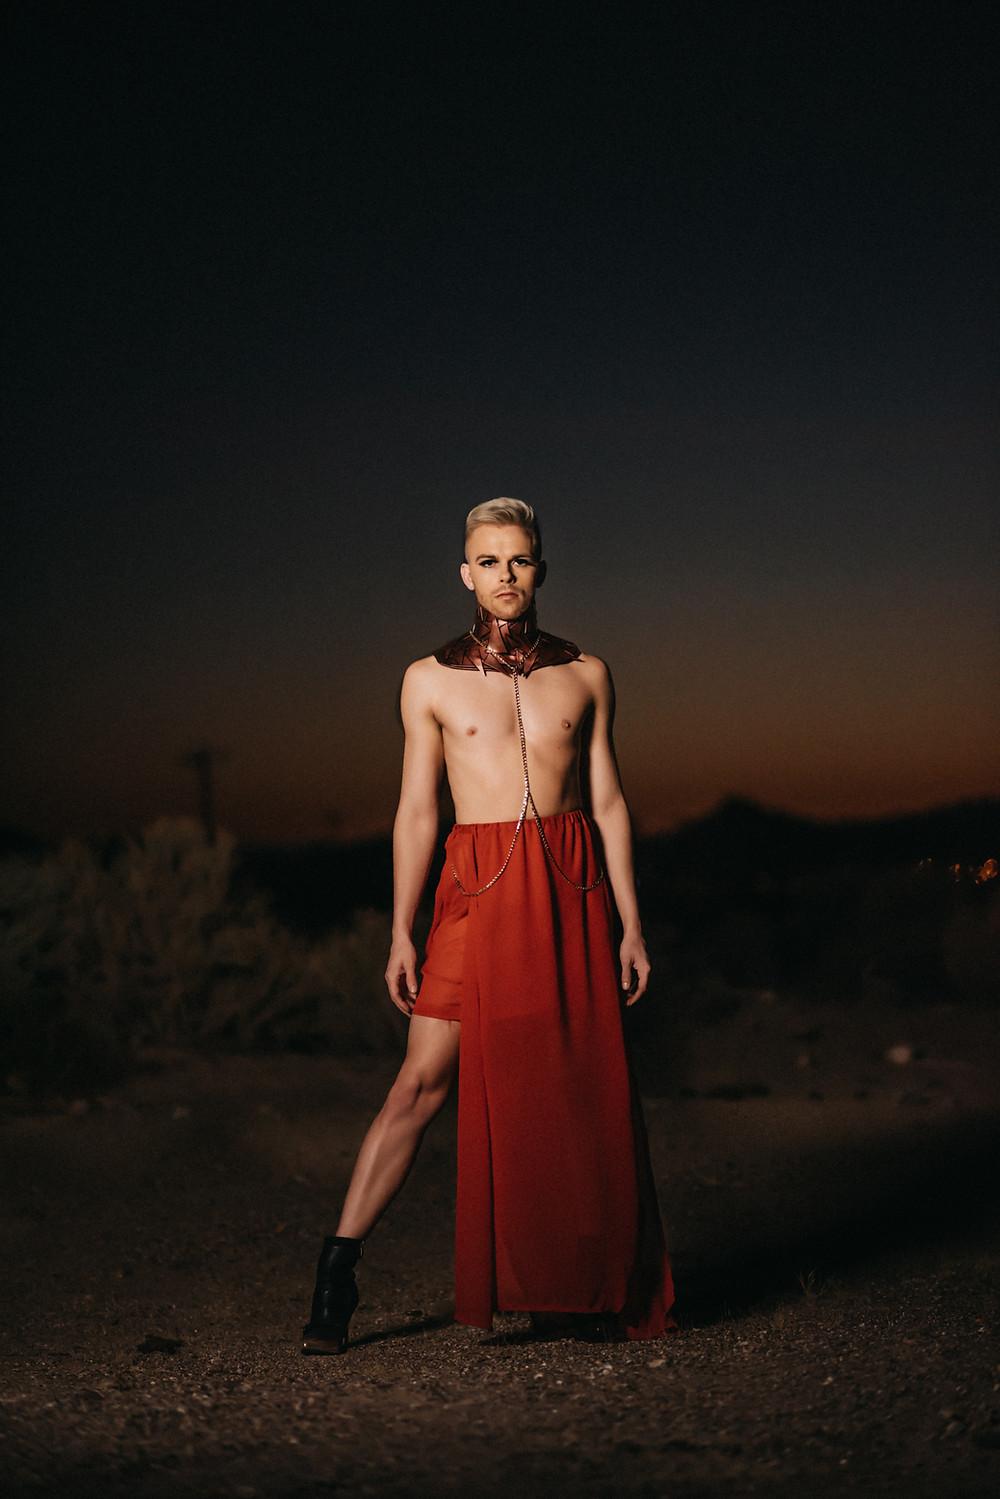 fashion, model, drag, los angeles, editorial, desert, sunset